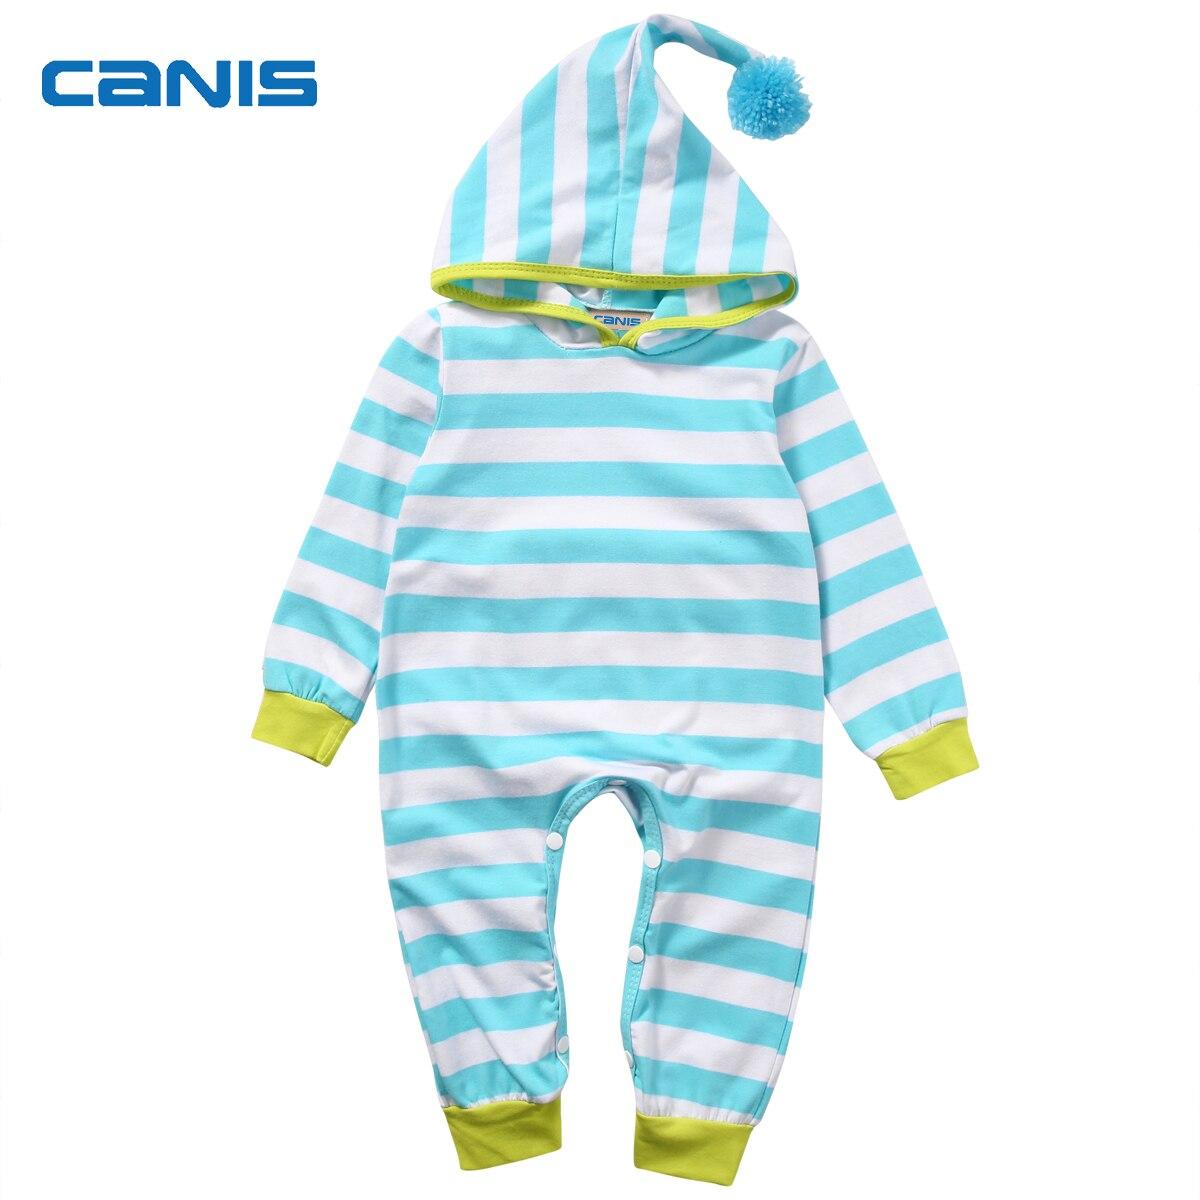 Stylish Blue Striped Hooded Newborn Baby Boy Girls Romper Jumpsuit ...